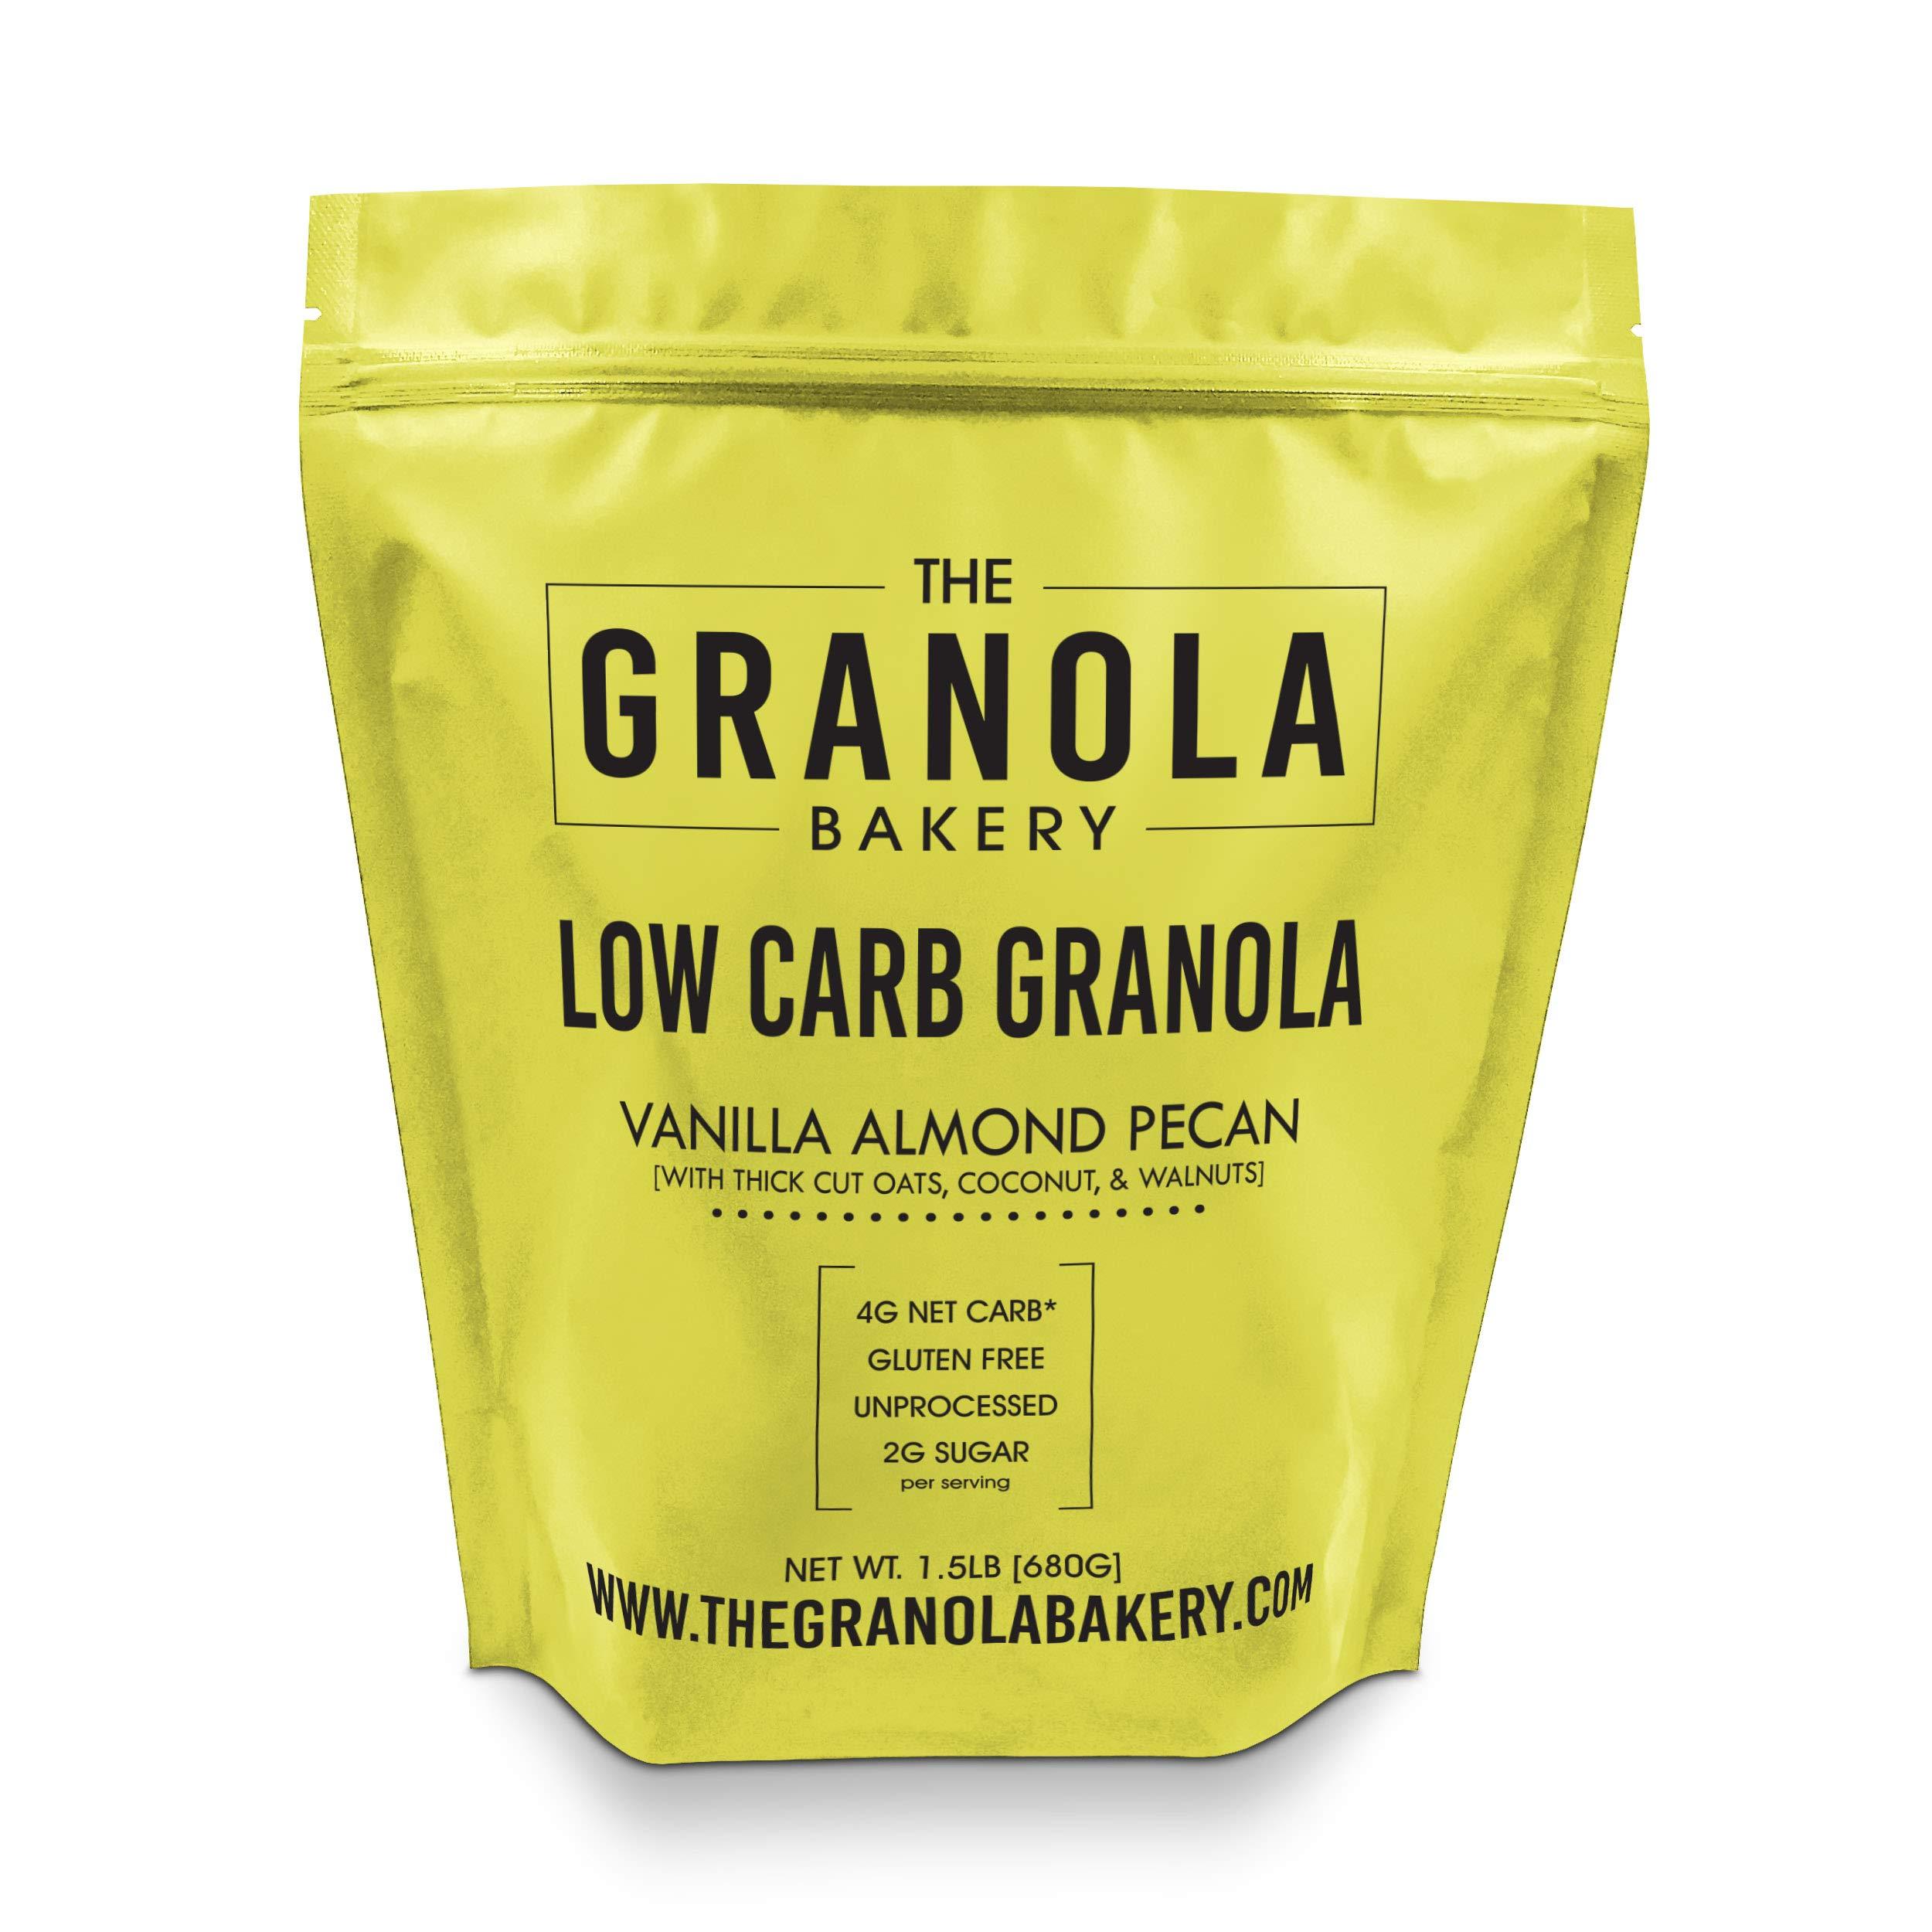 ELAN Gluten Free Granola, Healthy Low Sugar Breakfast Cereal, Salt Free, Whole Grain, Non Gmo, Vegan Food (Pecan Almond Walnut, 1.33lb Bulk Bag) by Elan Granola